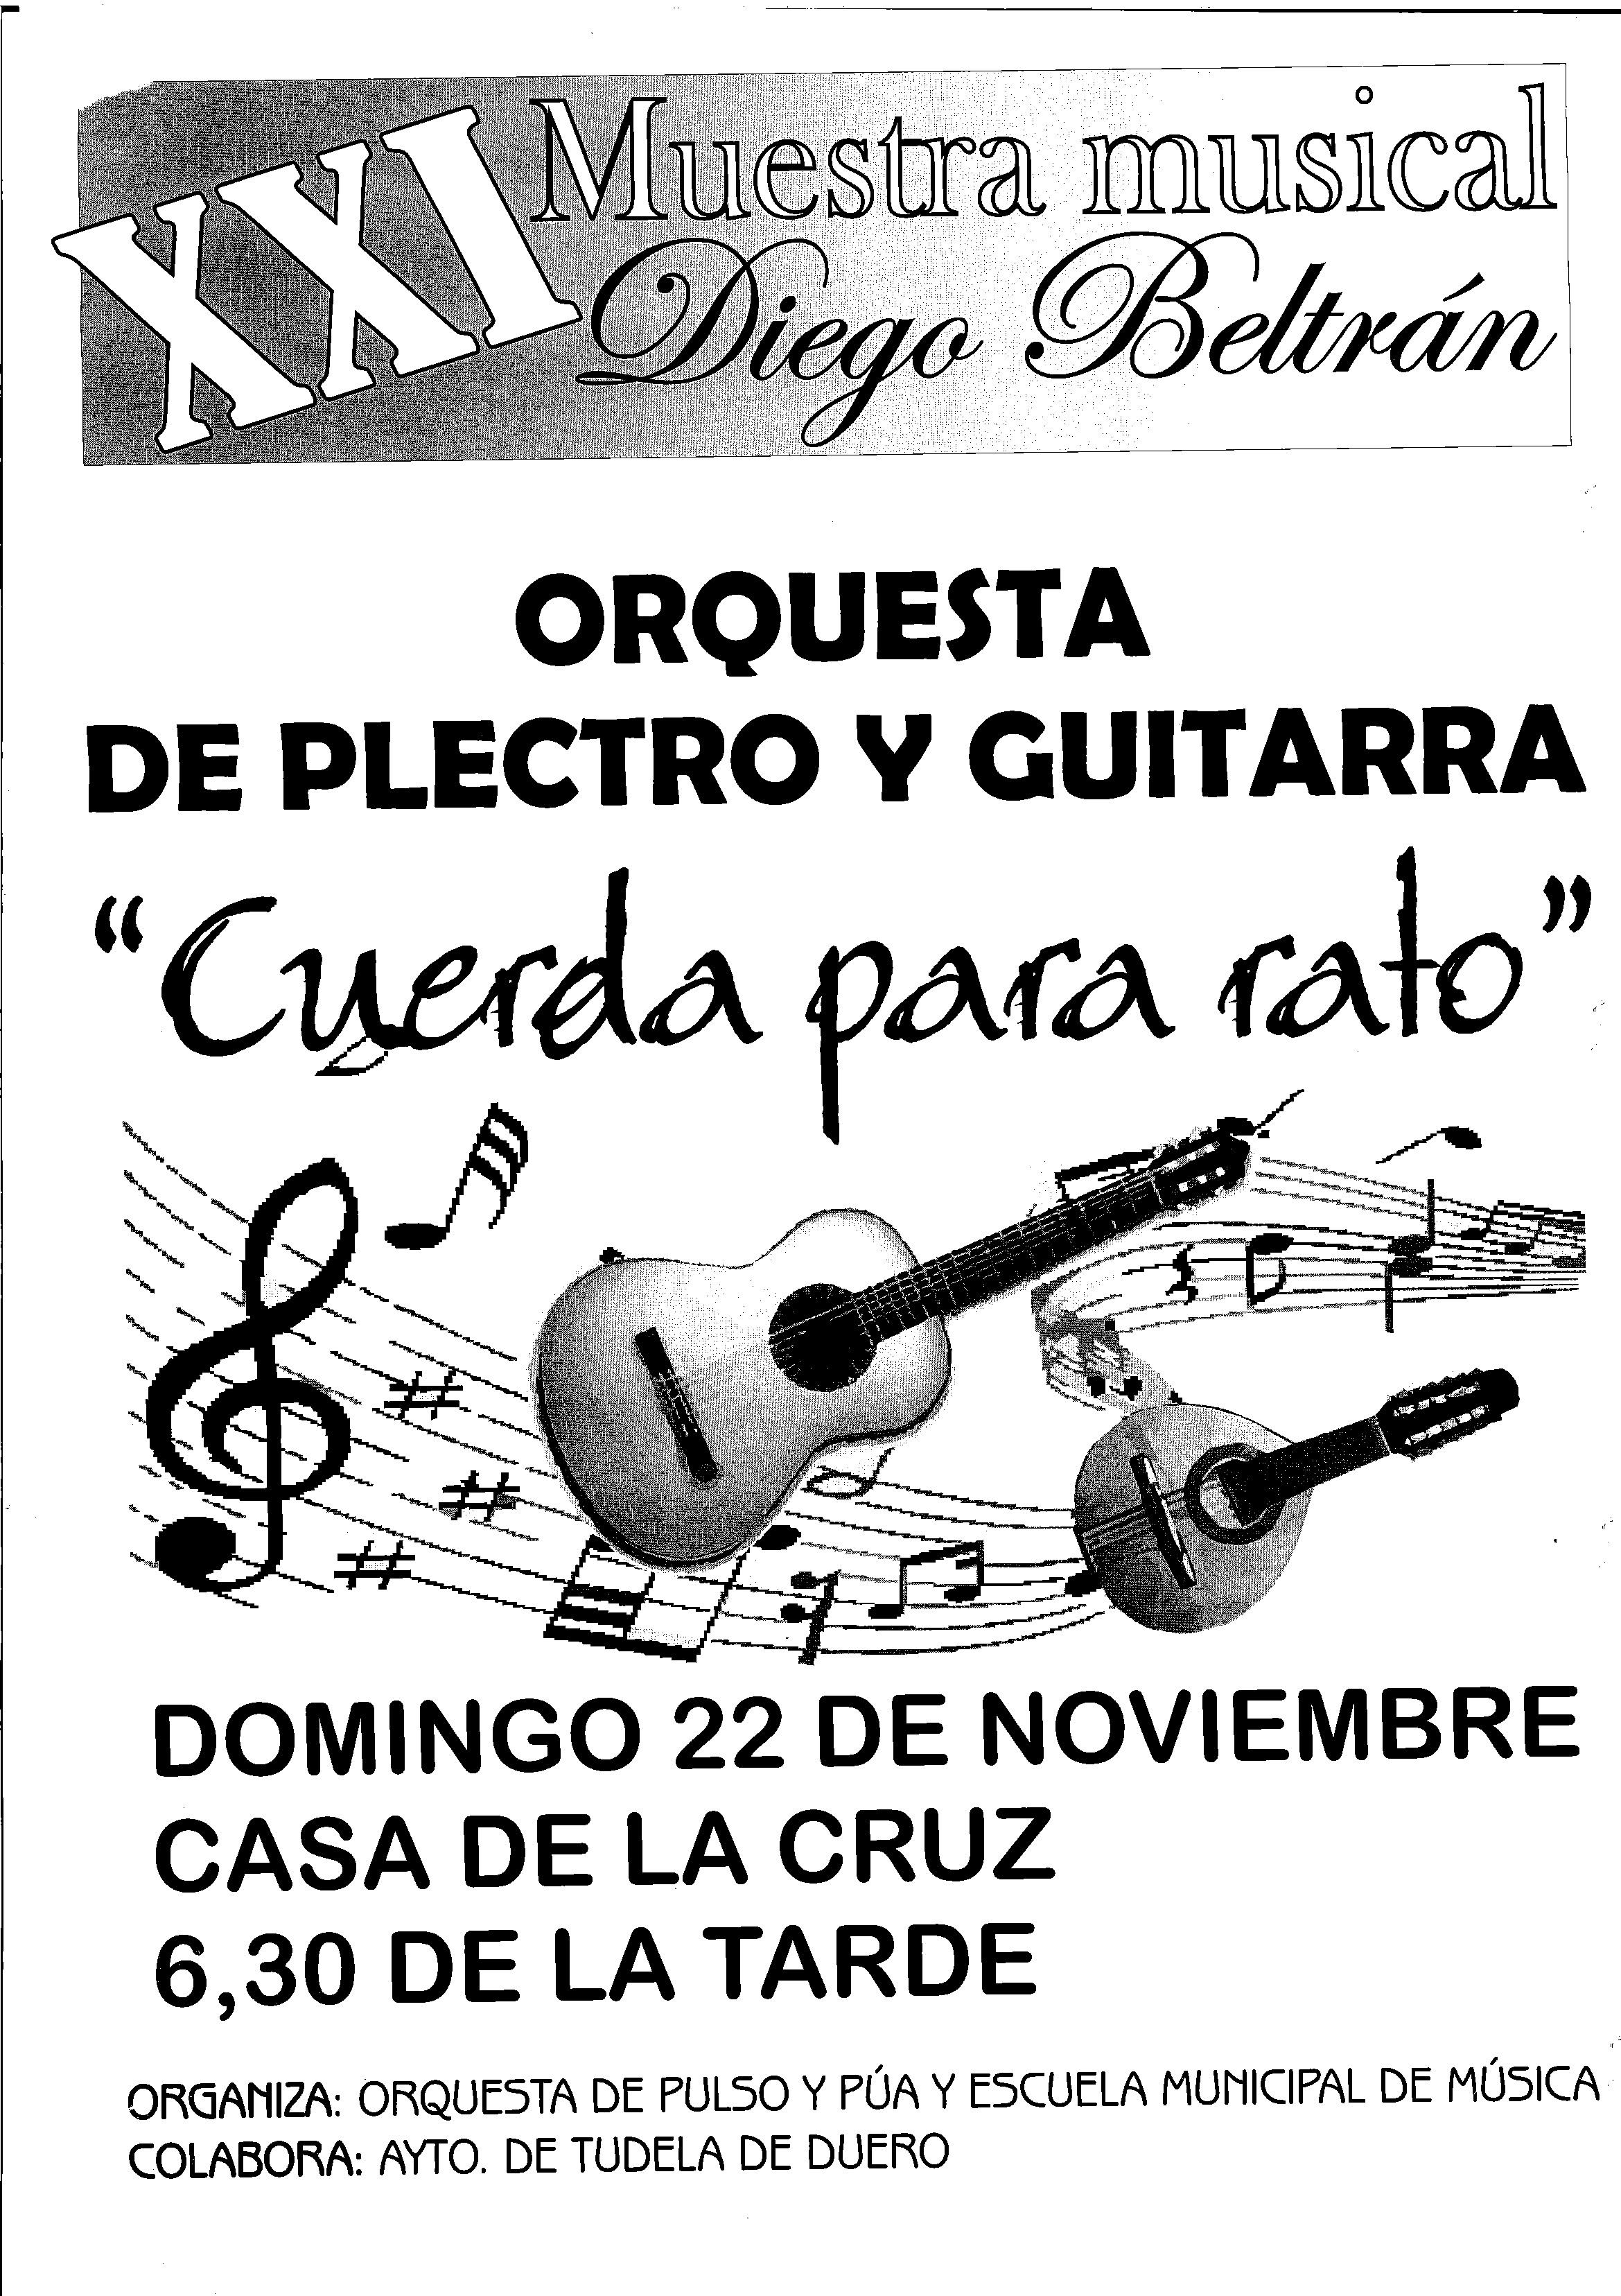 XXI Muestra Musical Diego Beltrán